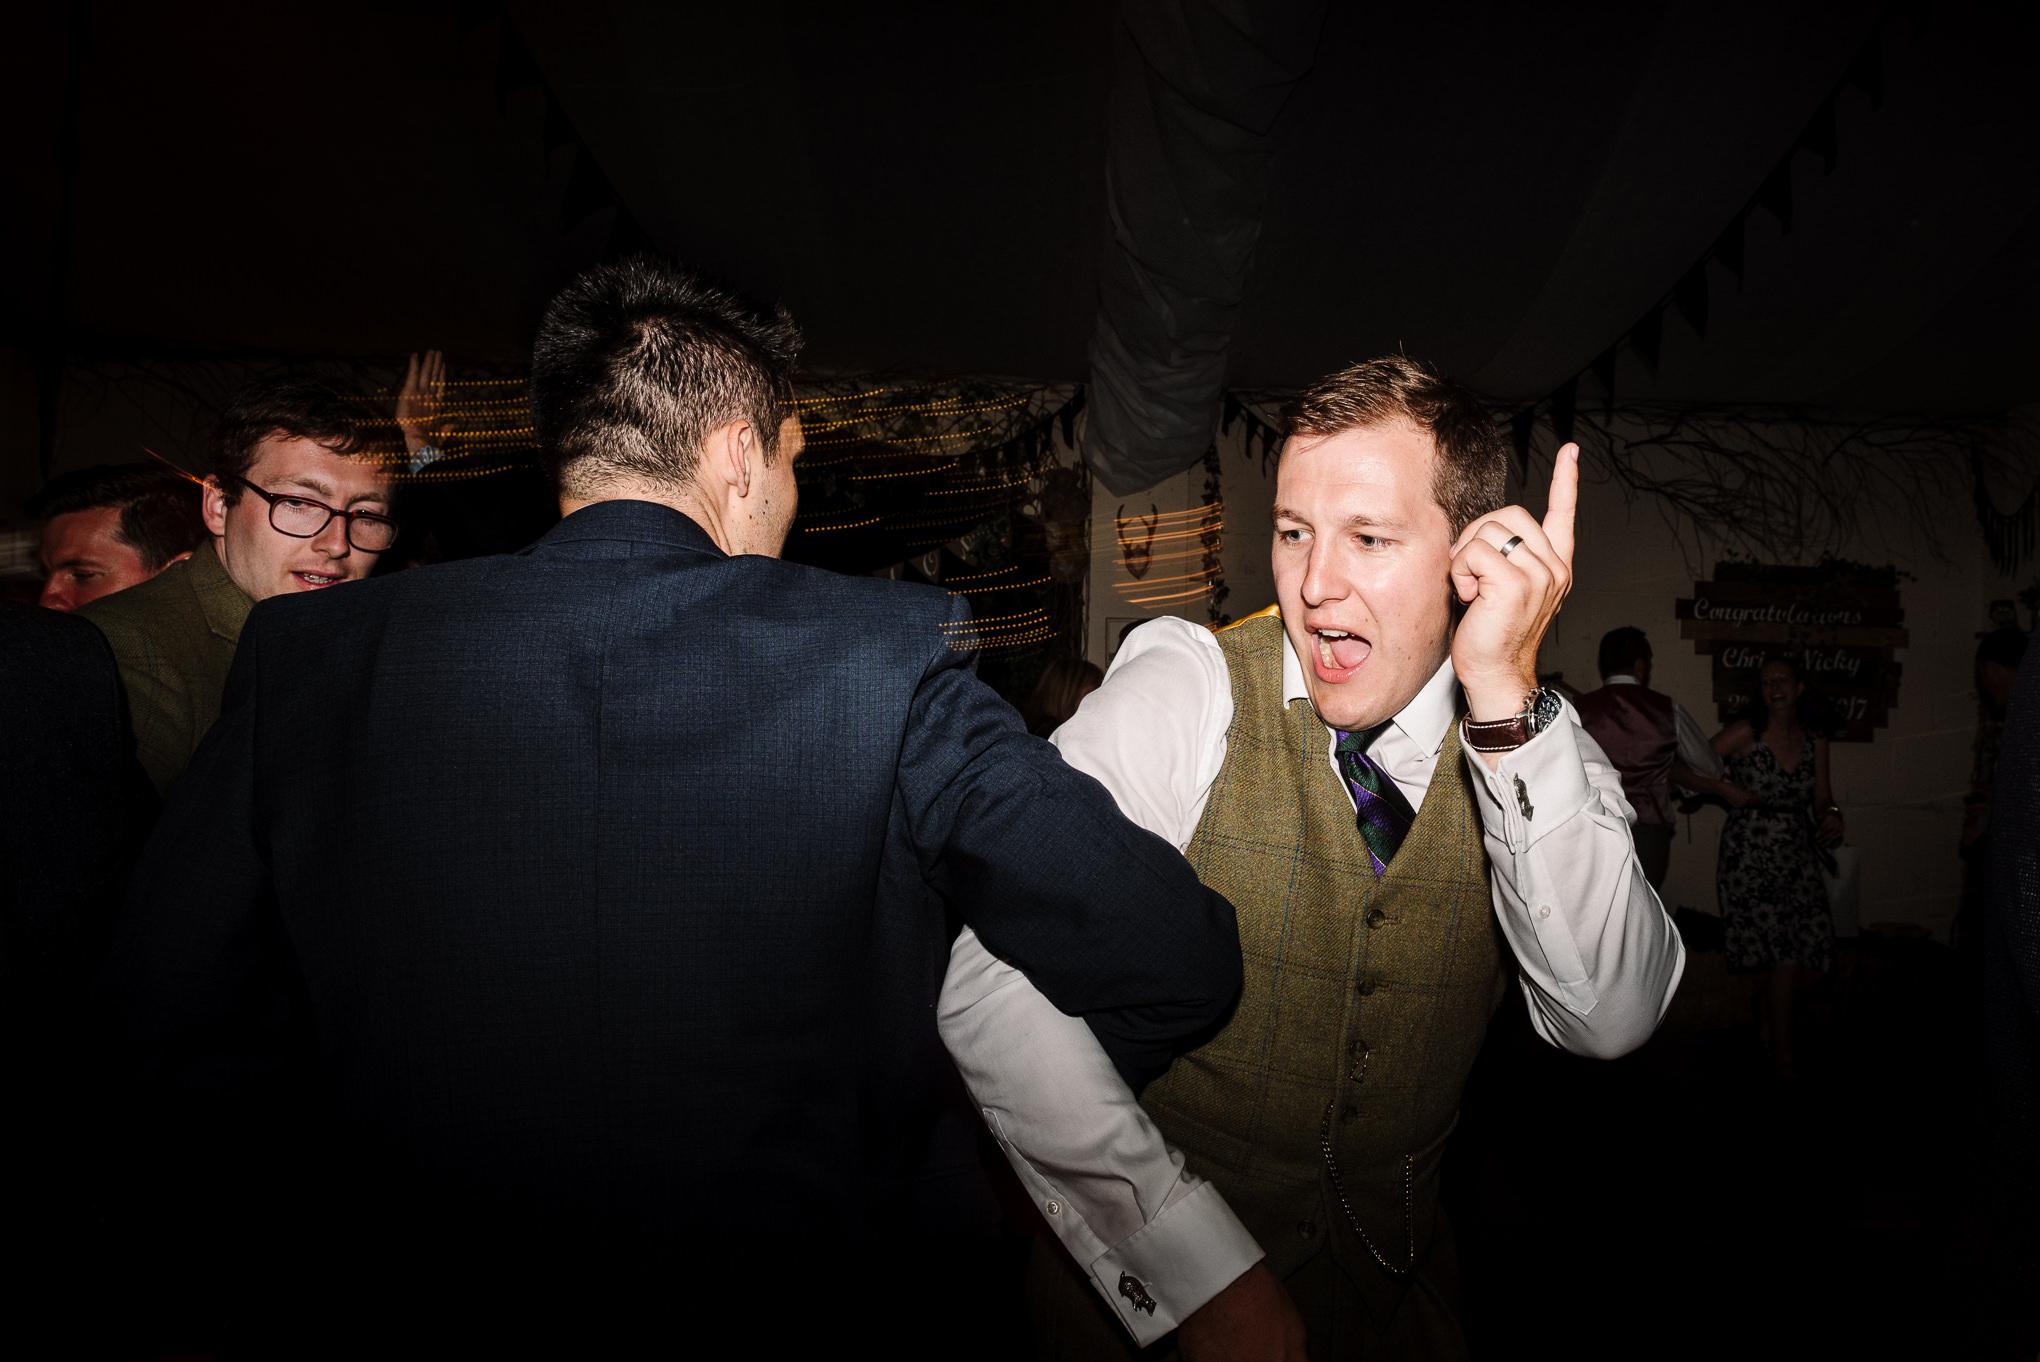 Groom on dance floor. Fun wedding photography